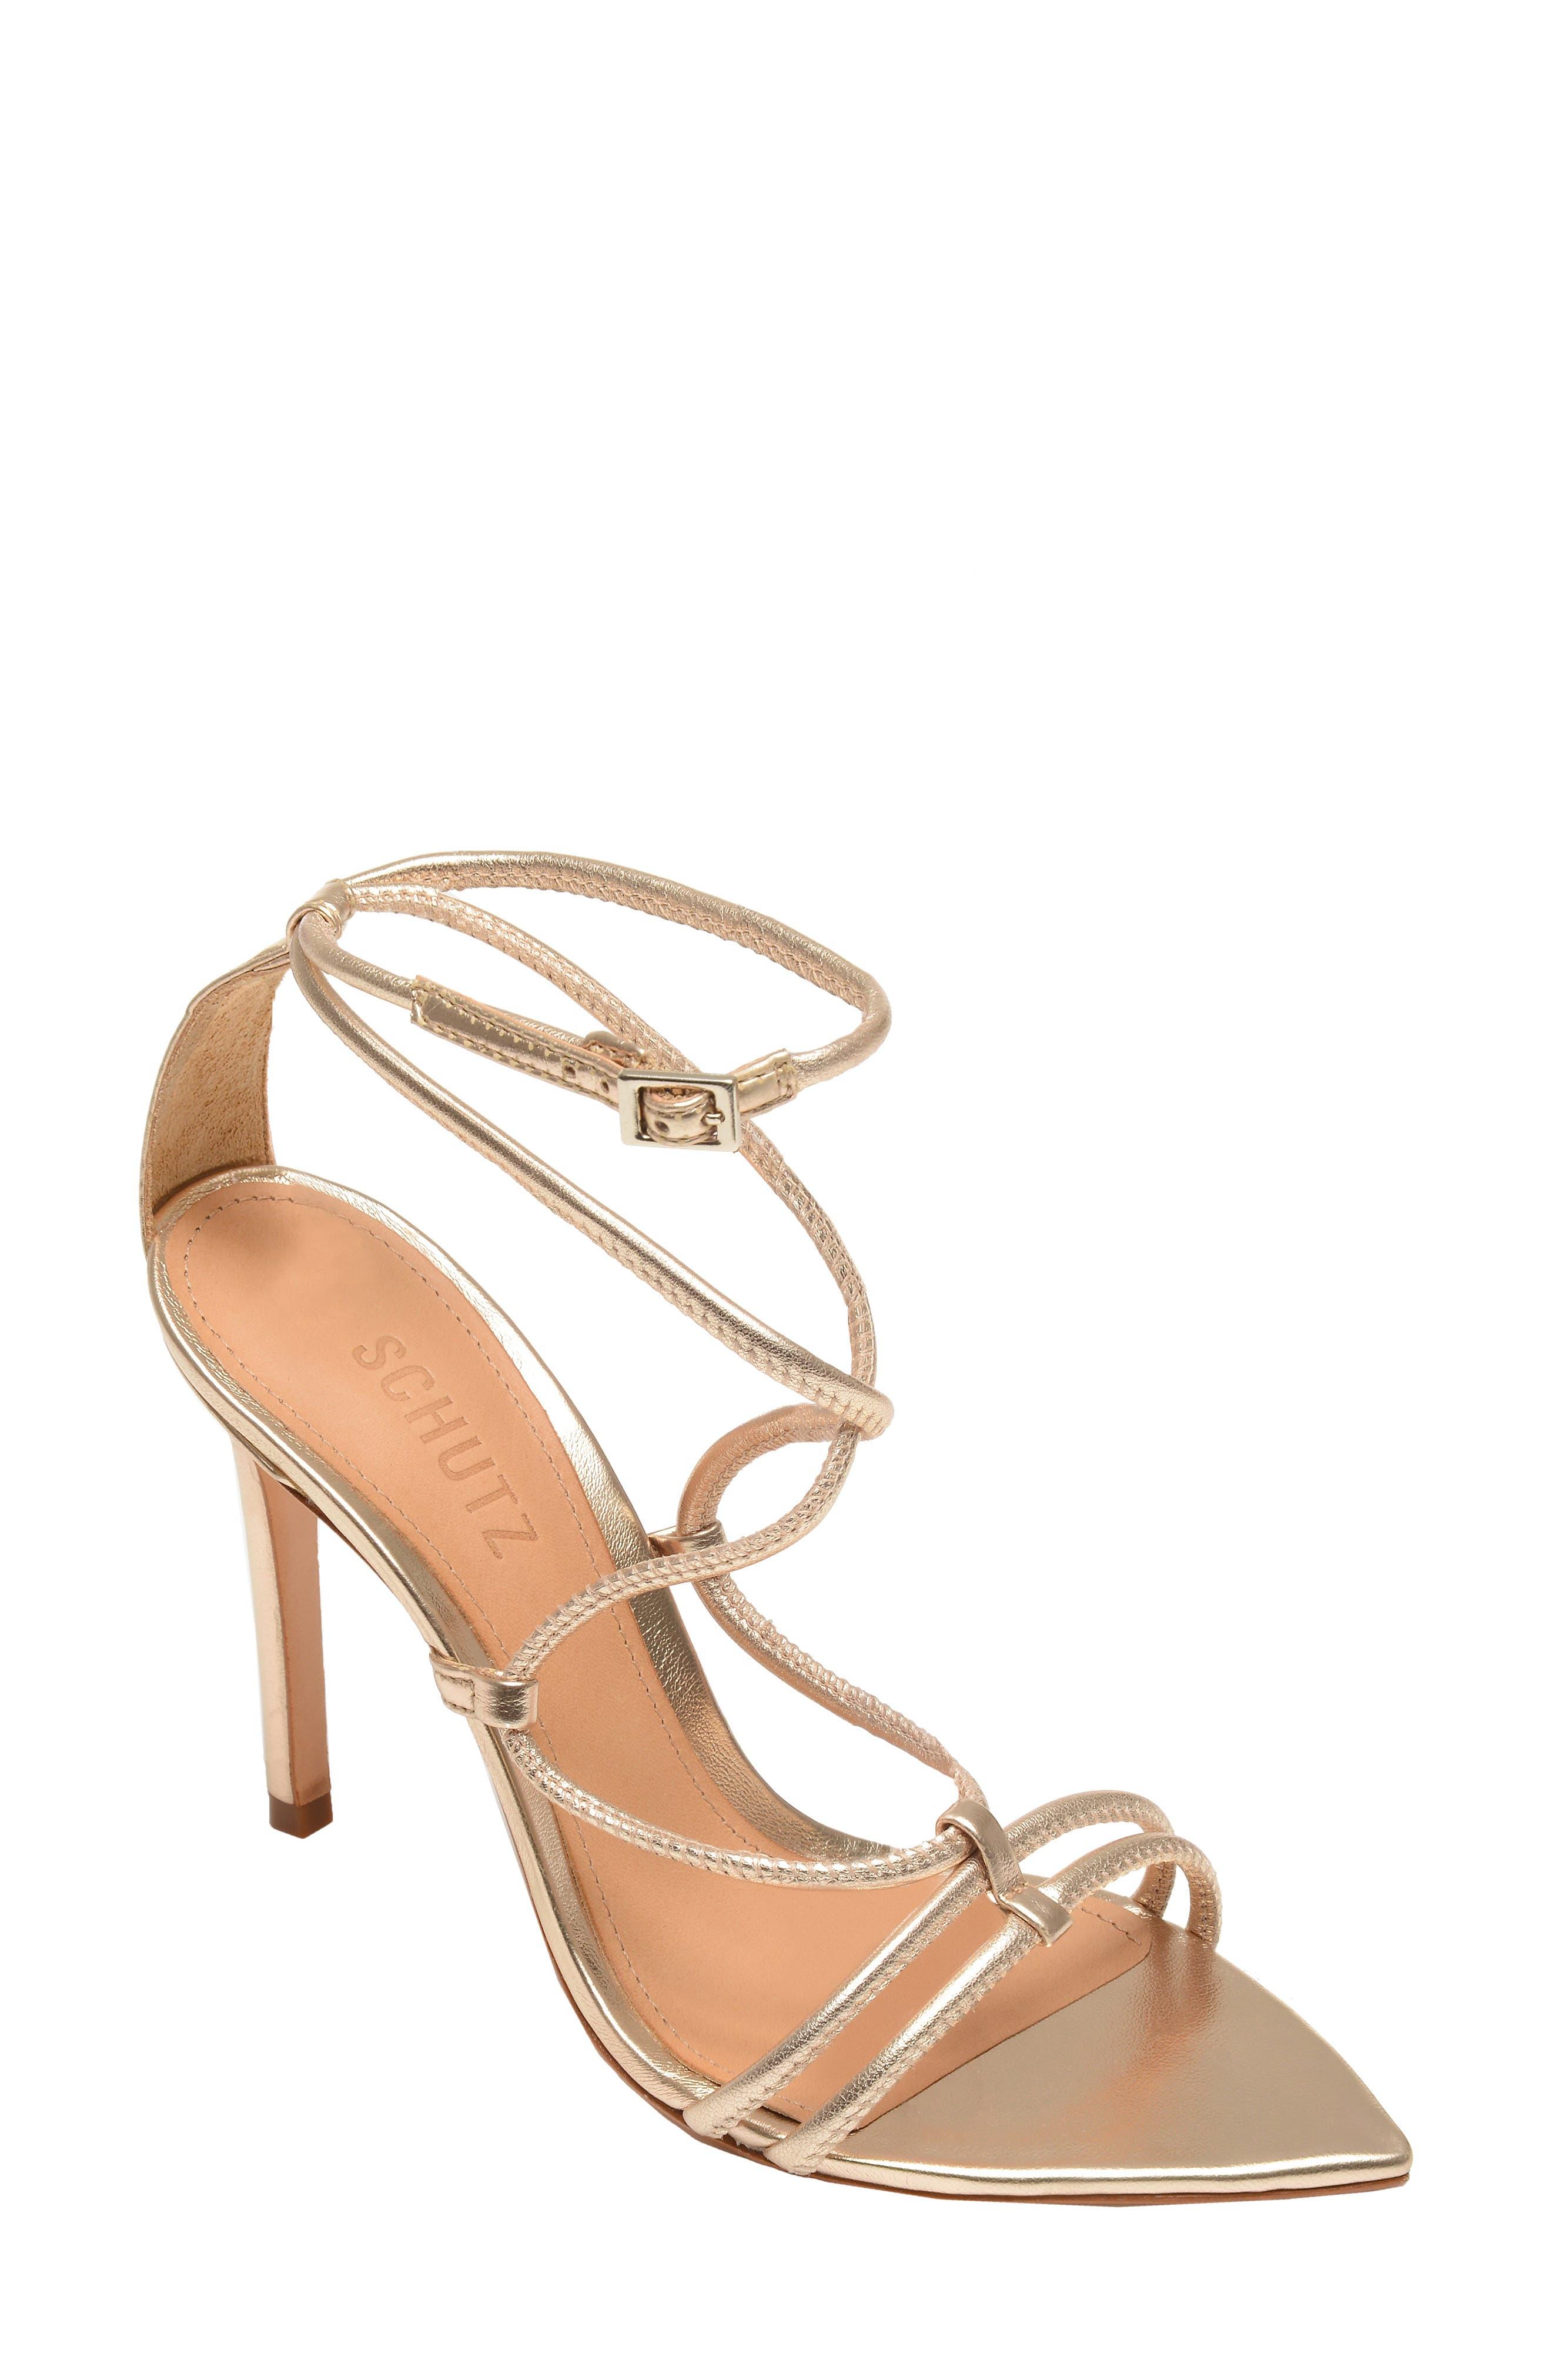 Schutz Evellyn Strappy Sandal- Metallic